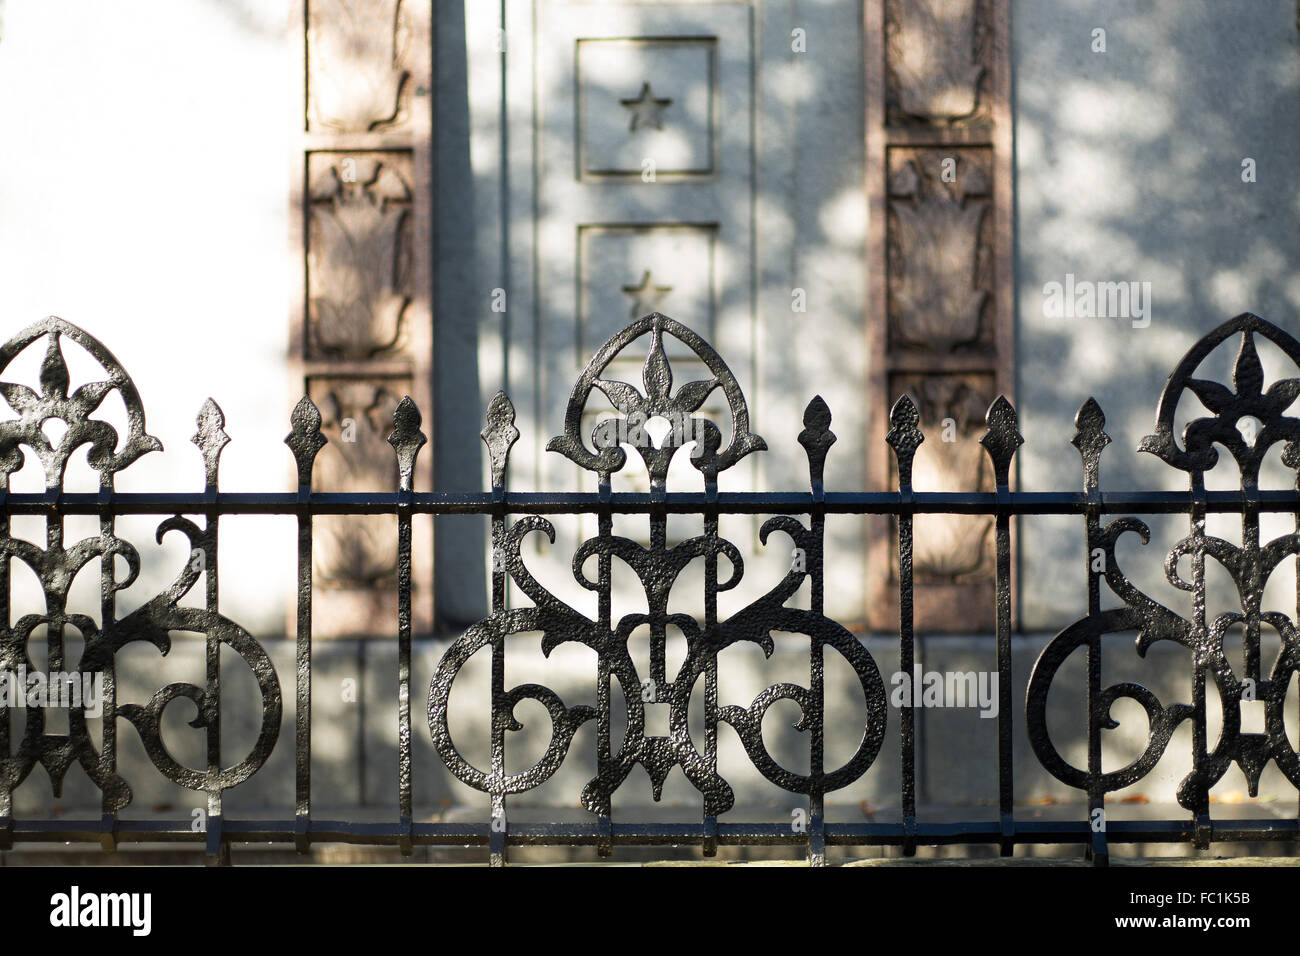 Detail view of Cast Iron Railings. Kilmorey Mausoleum, Richmond, United Kingdom. Architect: Kaner Olette Architects, - Stock Image